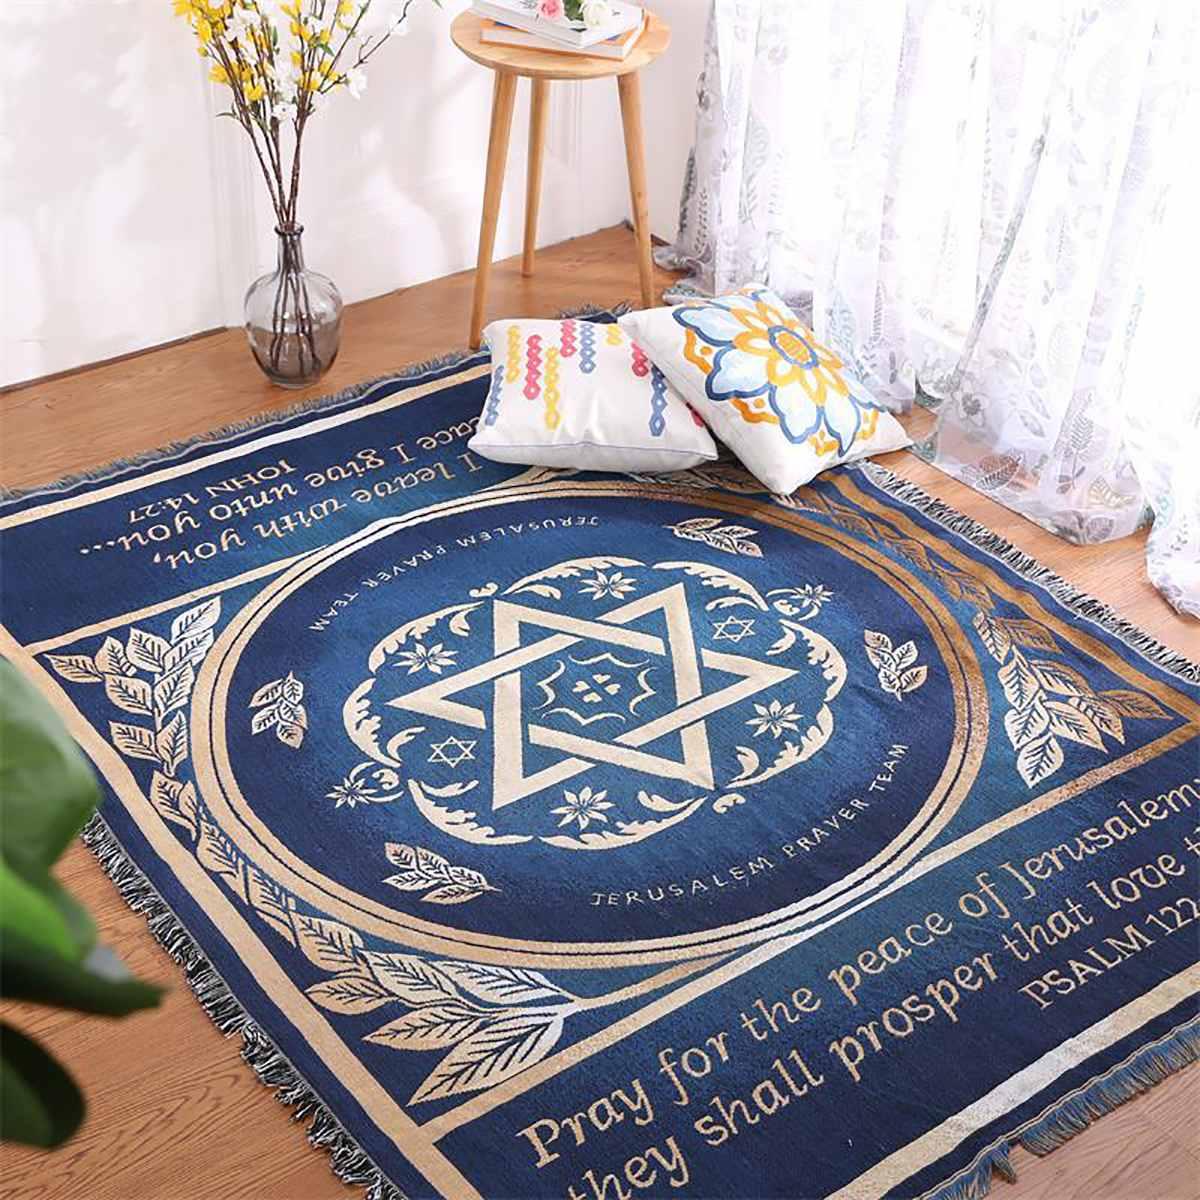 Israel Prayer Blanket Carpet Tapestry Sofa Knit Throw Towel Christian Gift Livingroom Bed Blanket Middle East Decorative Blanket